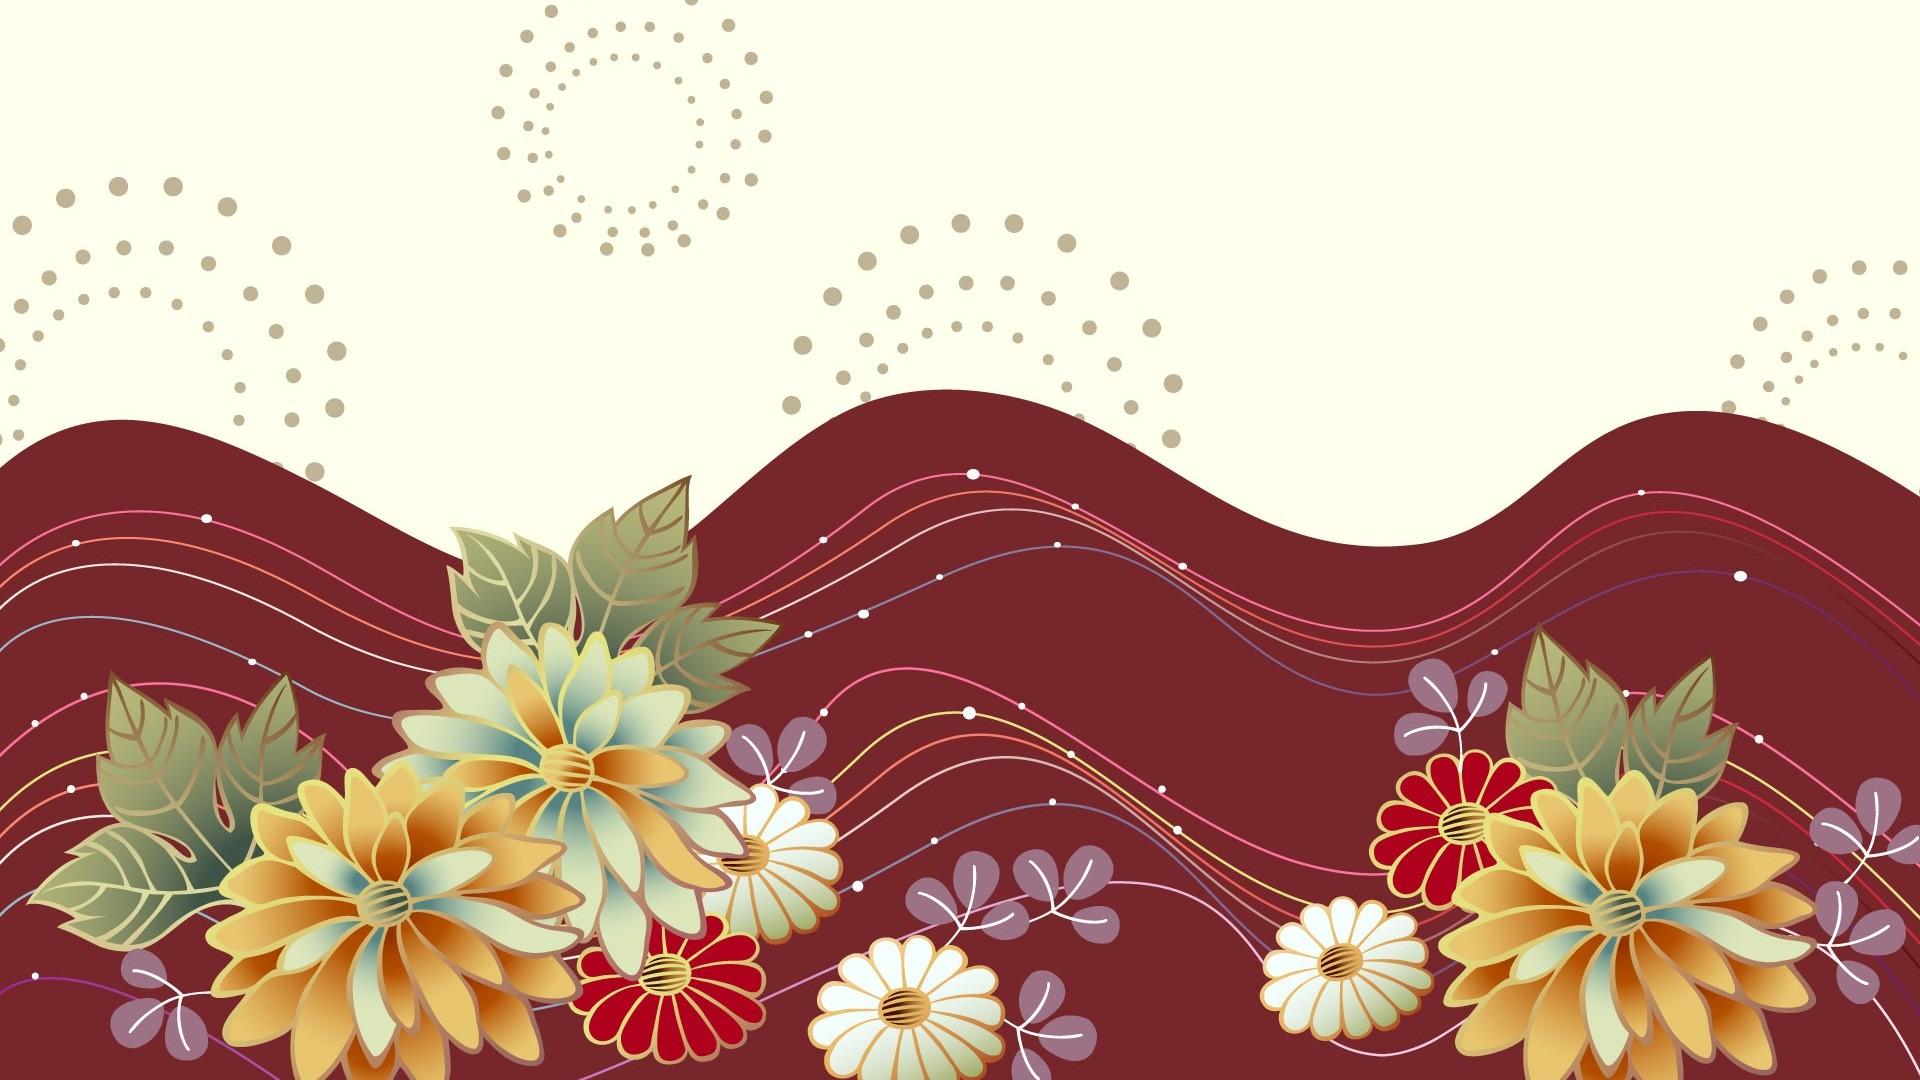 Women's Day Vector Flowers full hd image